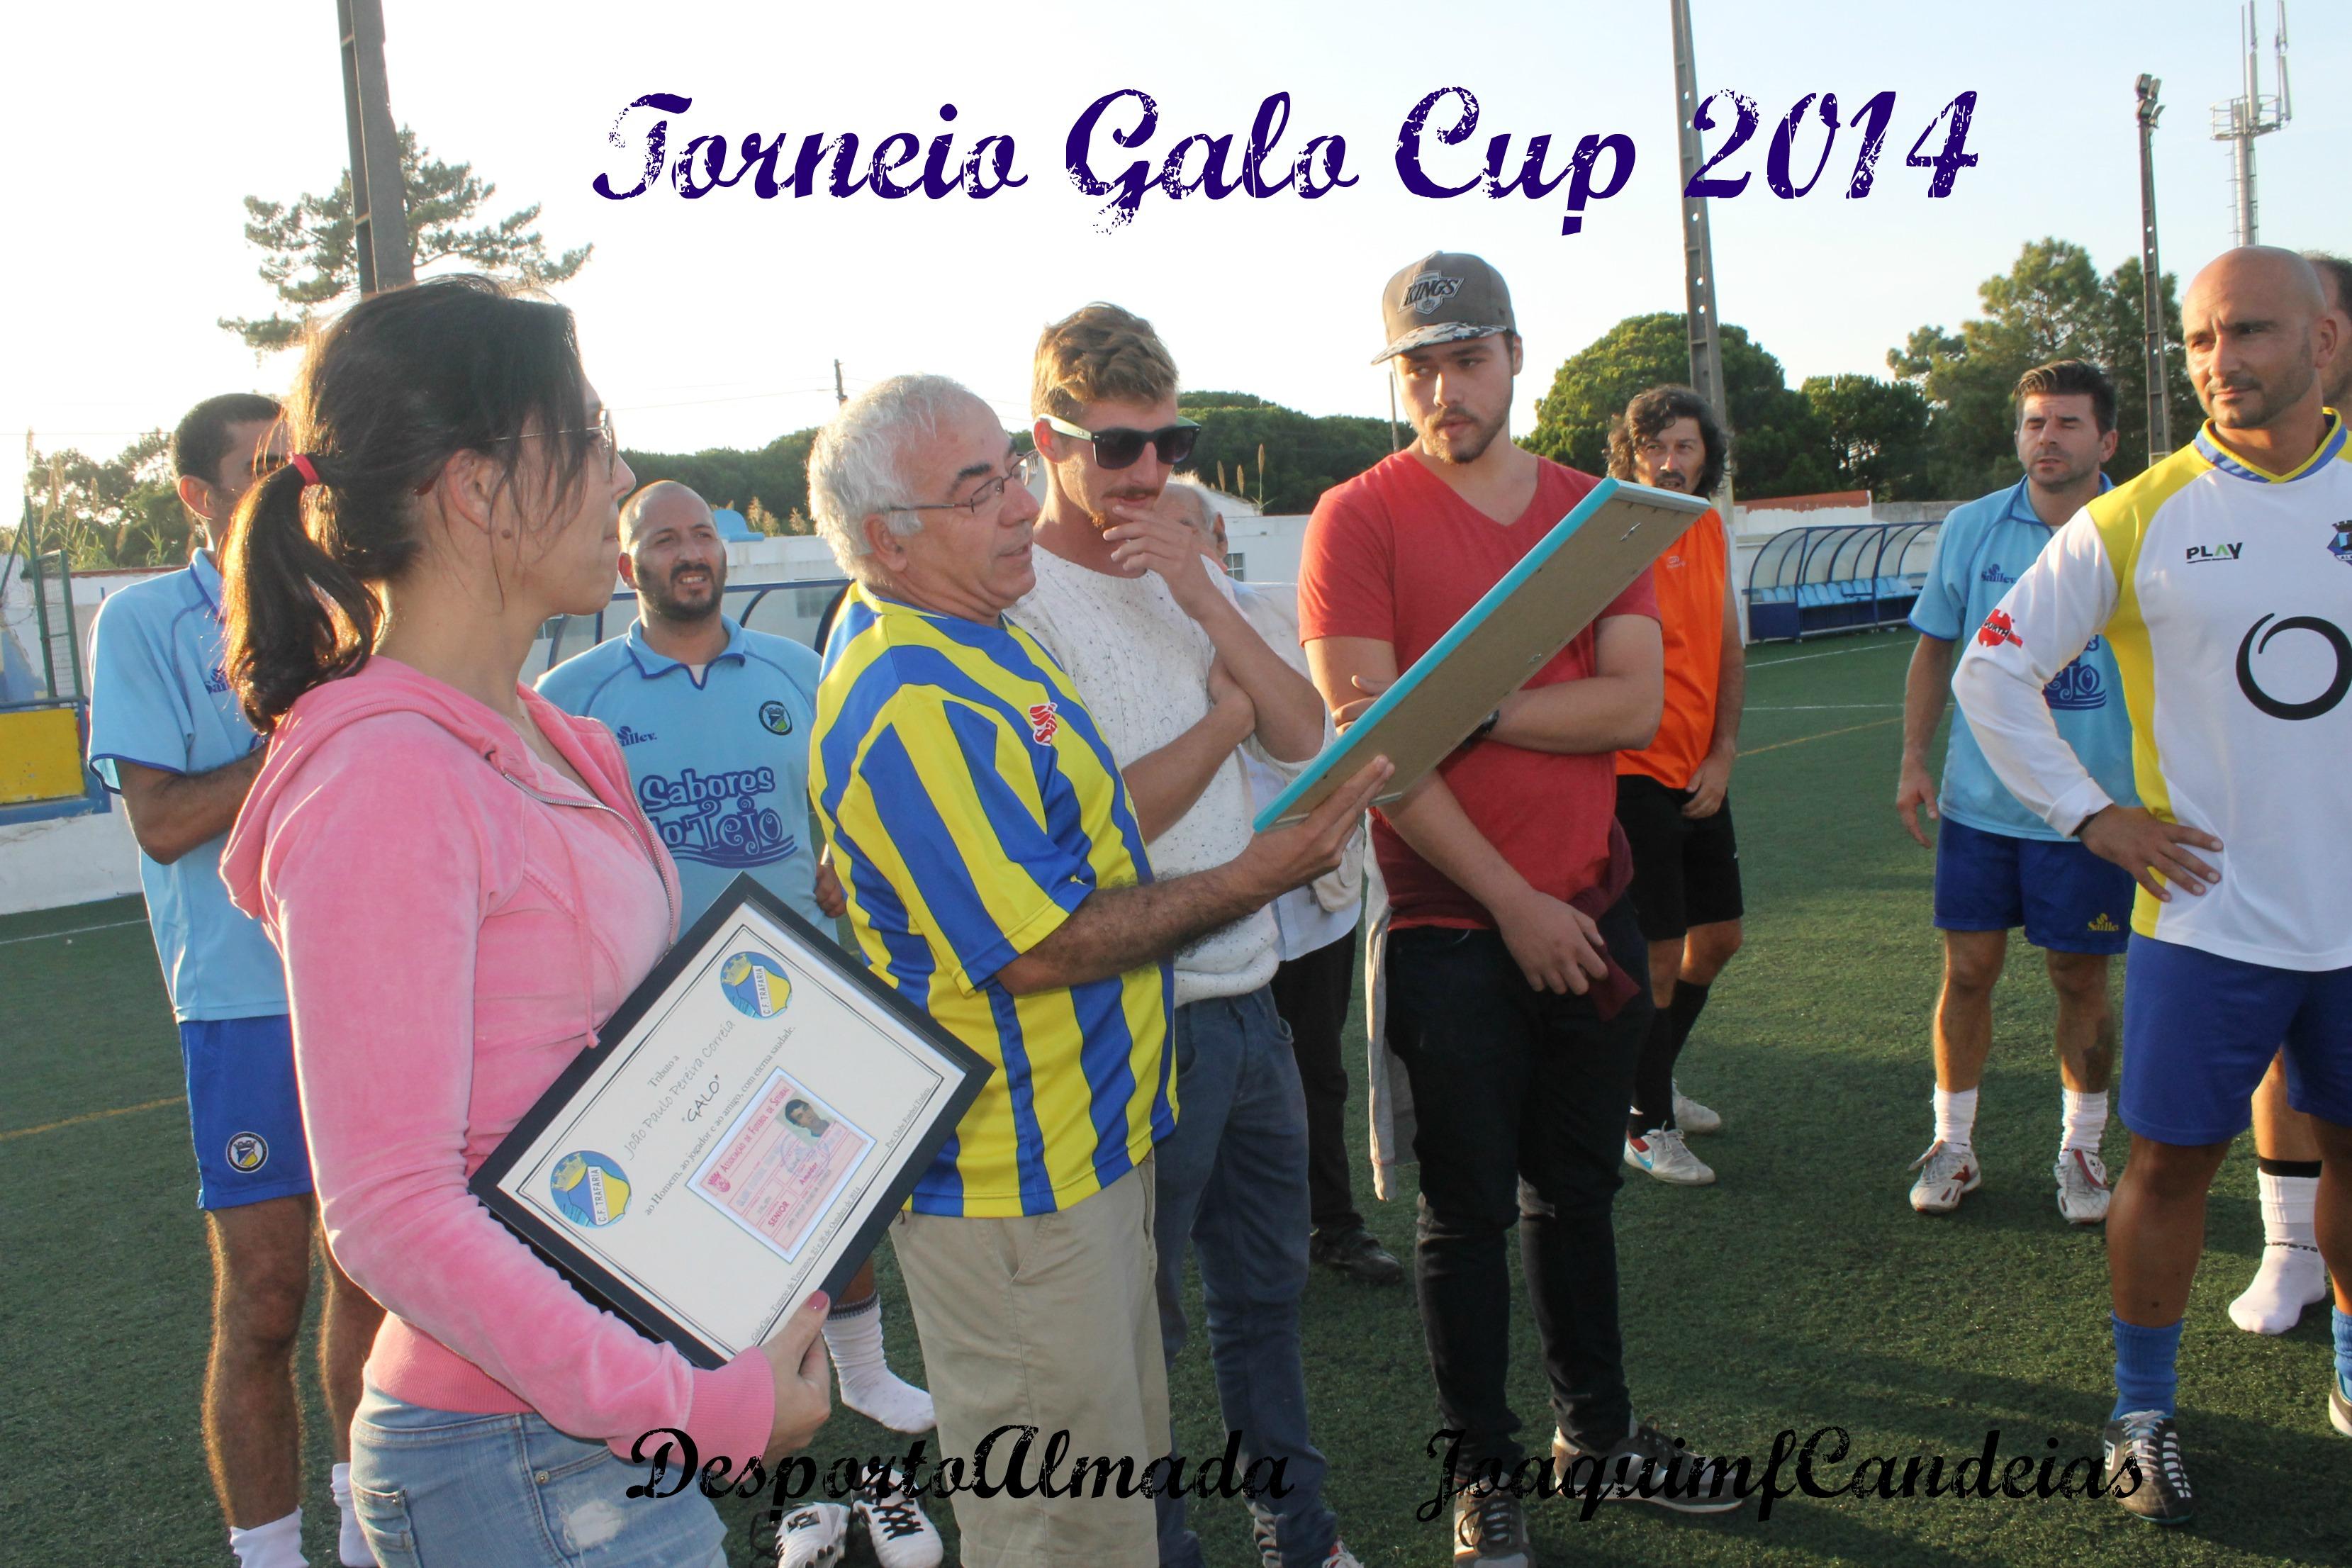 Torneio Galo Cup IMG_0613.jpg JoaquimfCandeias.jpg